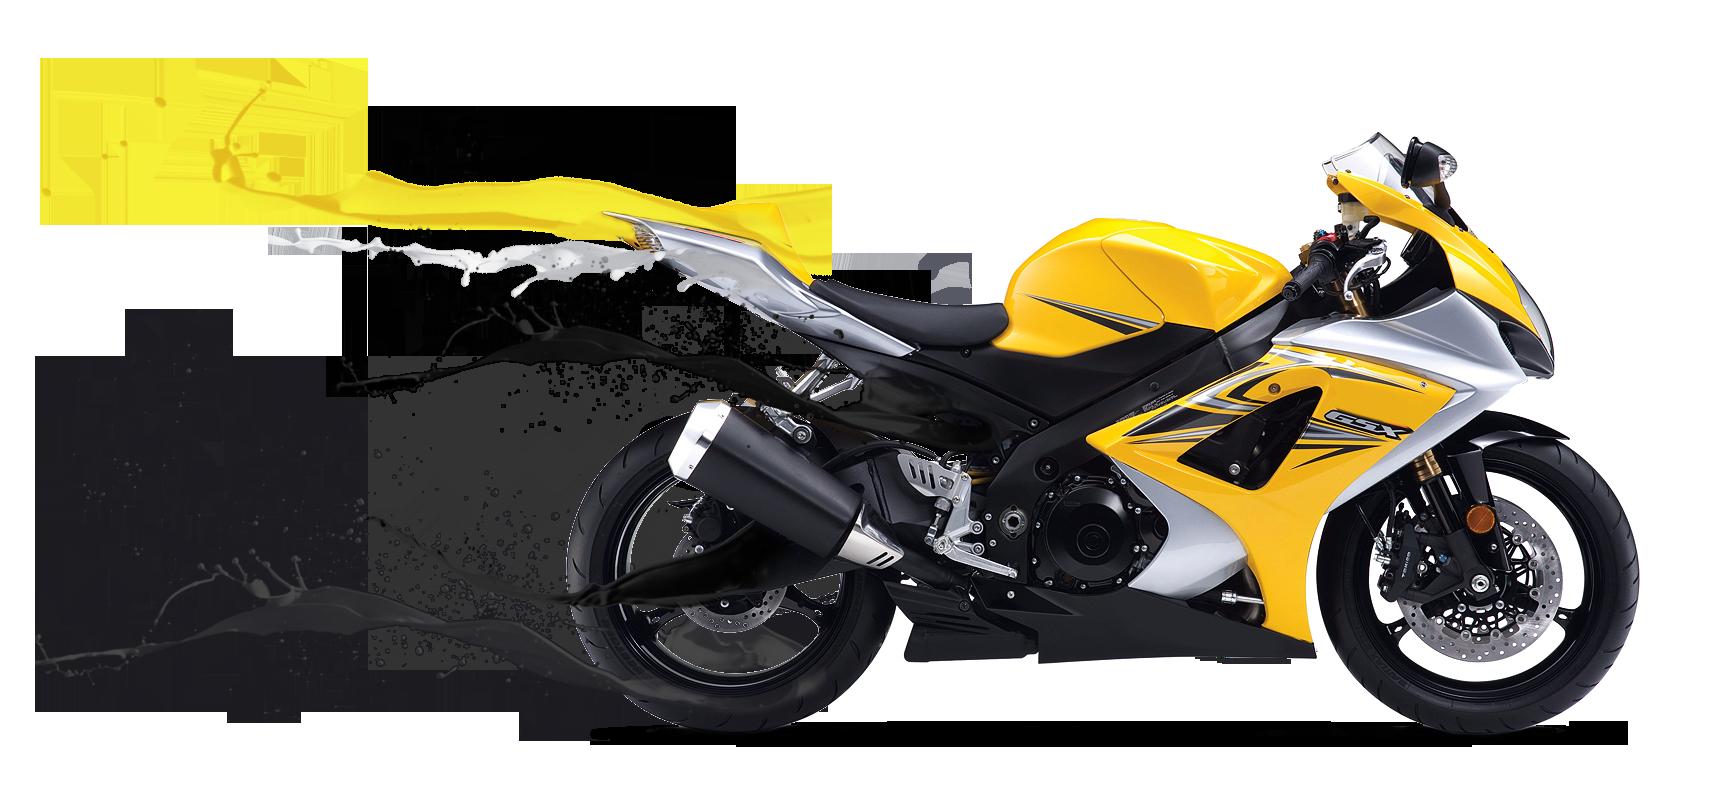 Motorbike HD PNG - 90557